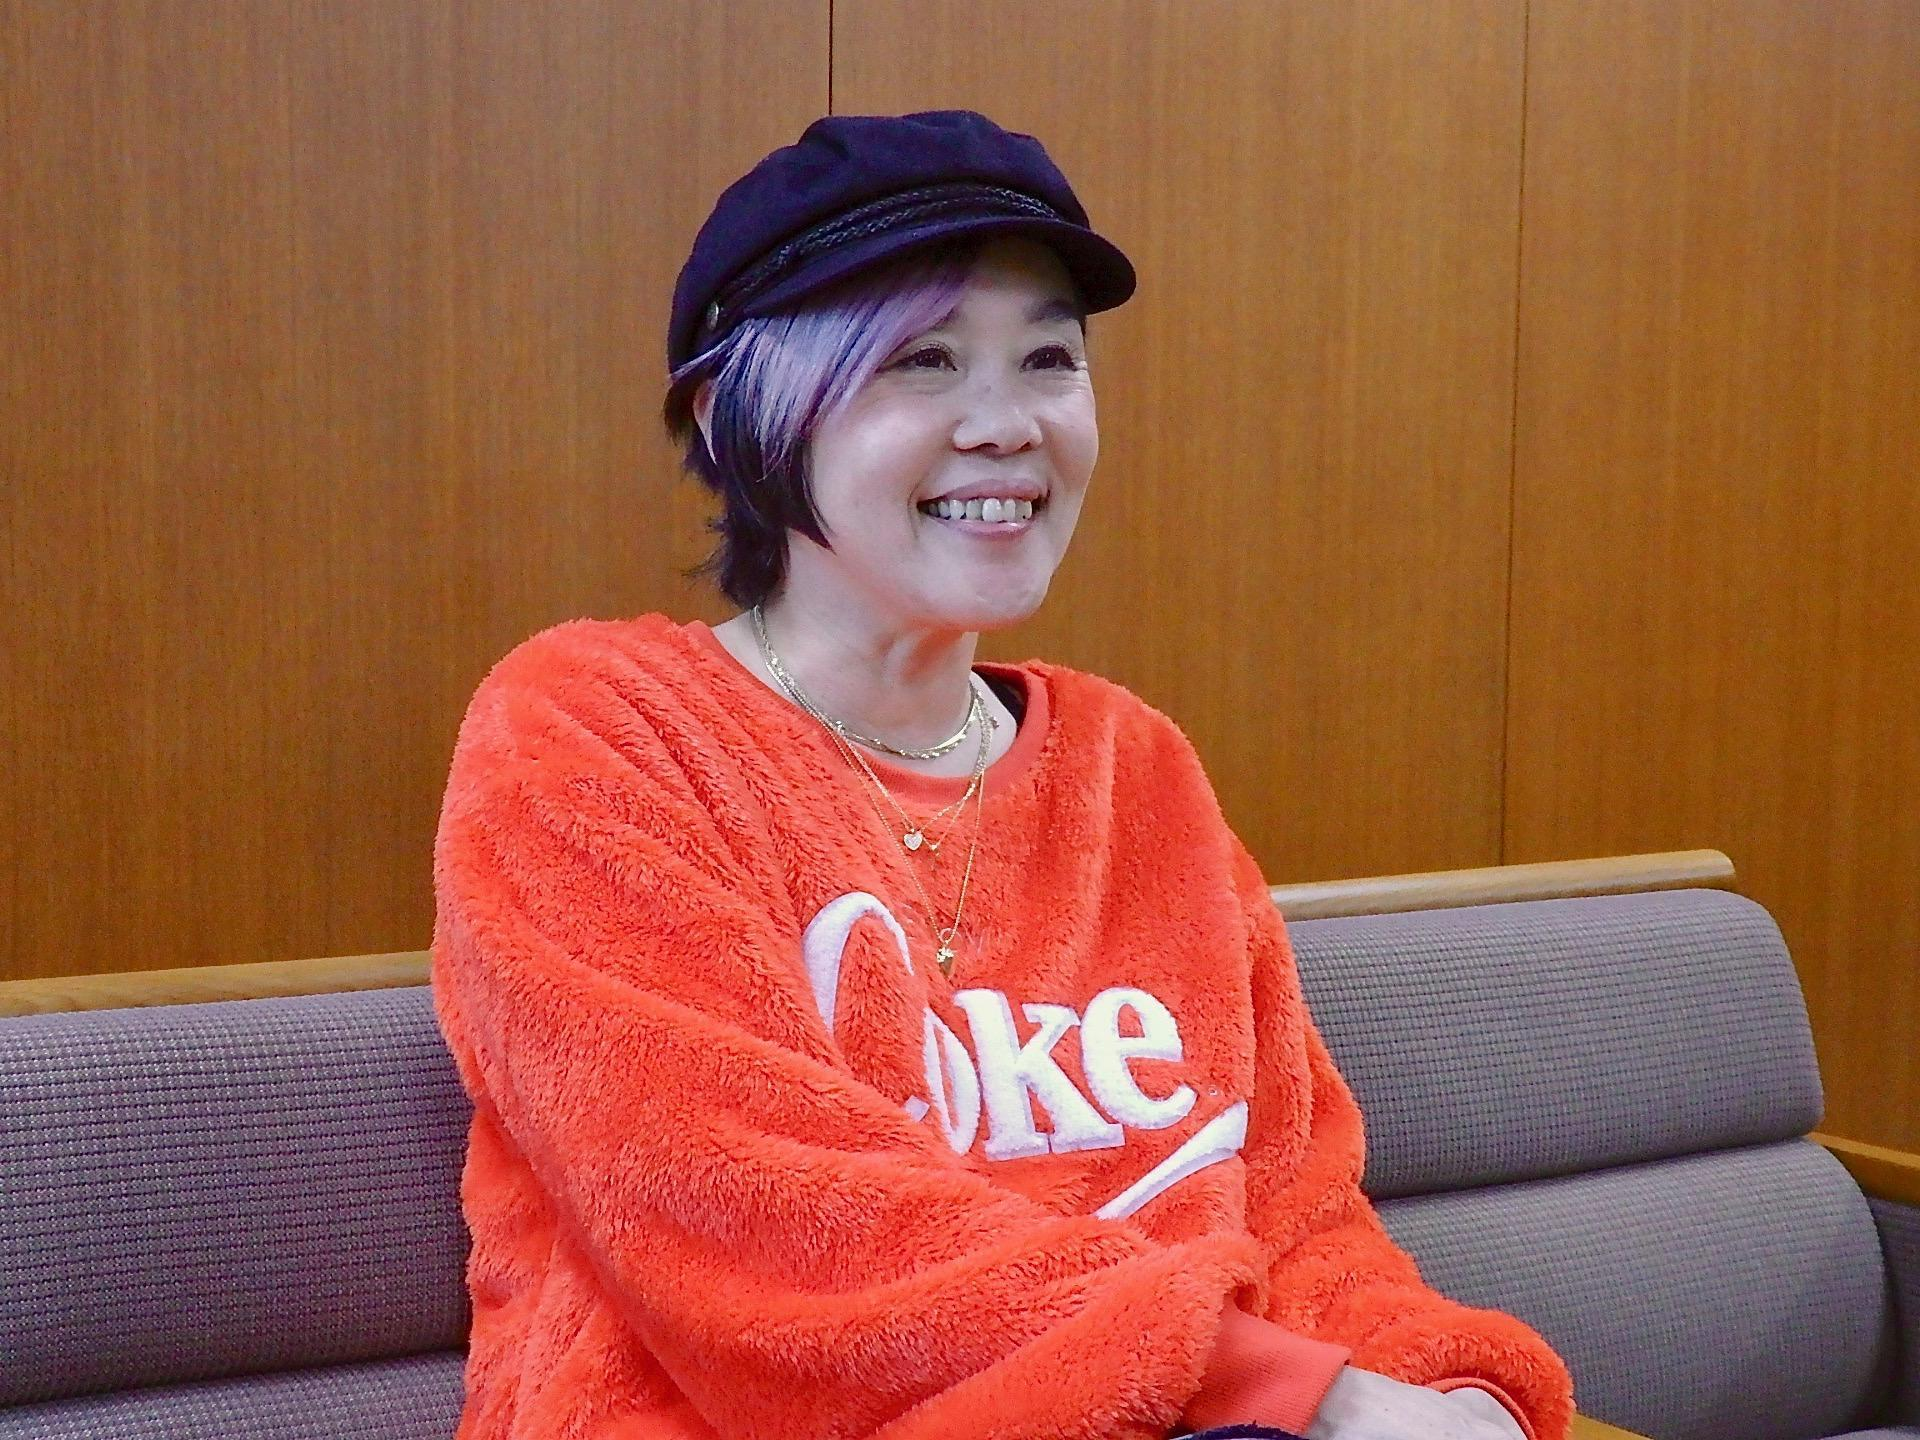 http://news.yoshimoto.co.jp/20180105003439-bf2b2b703990dd76678daf19d3bf6efdd4ff5c92.jpg